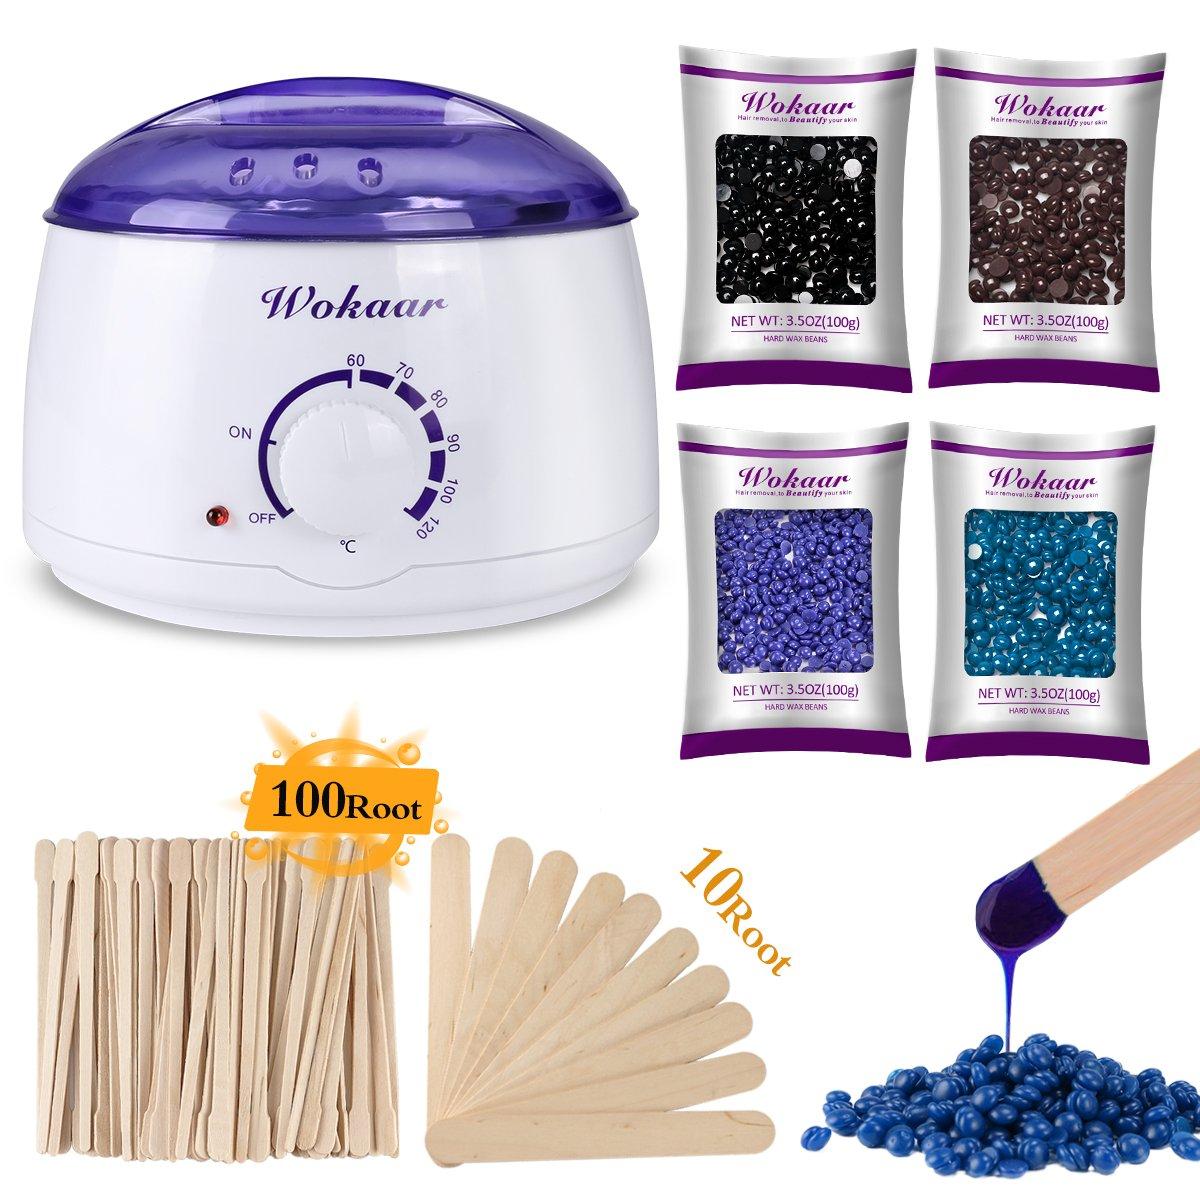 Wax Warmer Hair Removal Waxing Kit with 4 Flavors Hard Wax Beans + 10 Wax Applicator Sticks and 100 Small Eyebrow Removal Sticks Wokaar